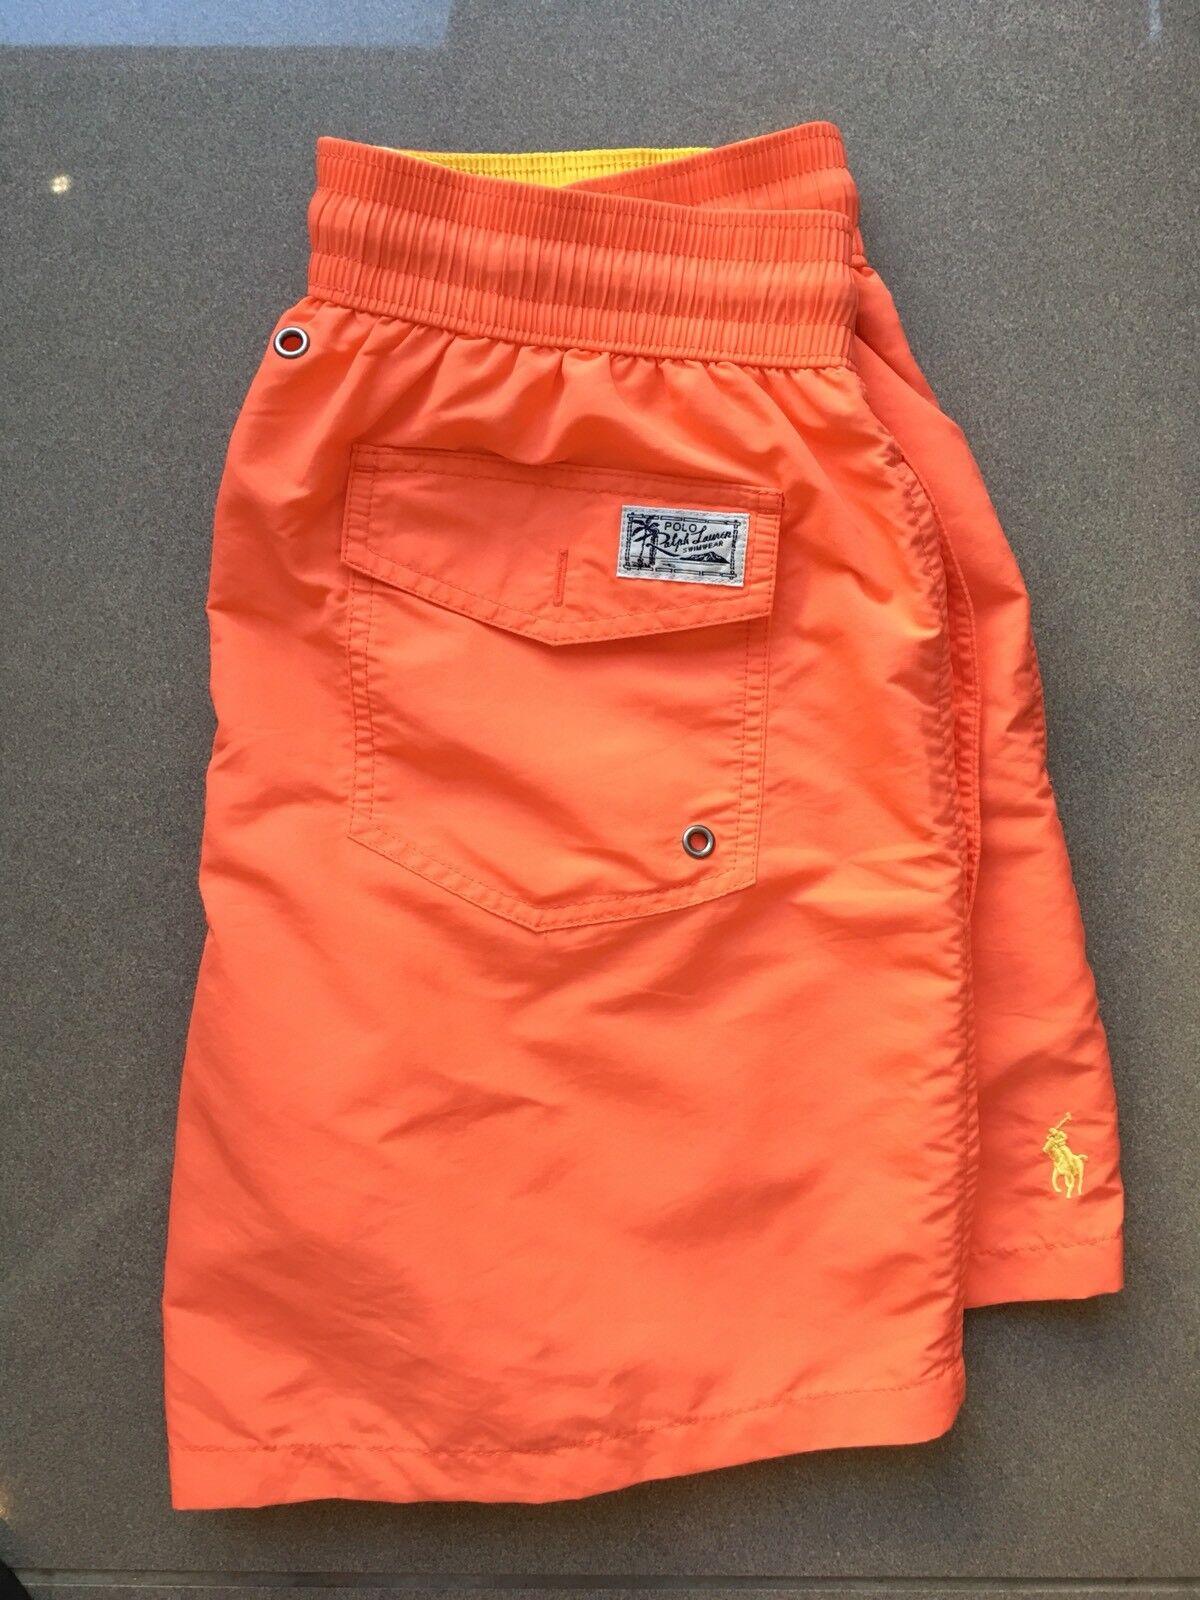 Polo Ralph Lauren Swim Shorts Traveler Trunk Electric Melon Size S or M